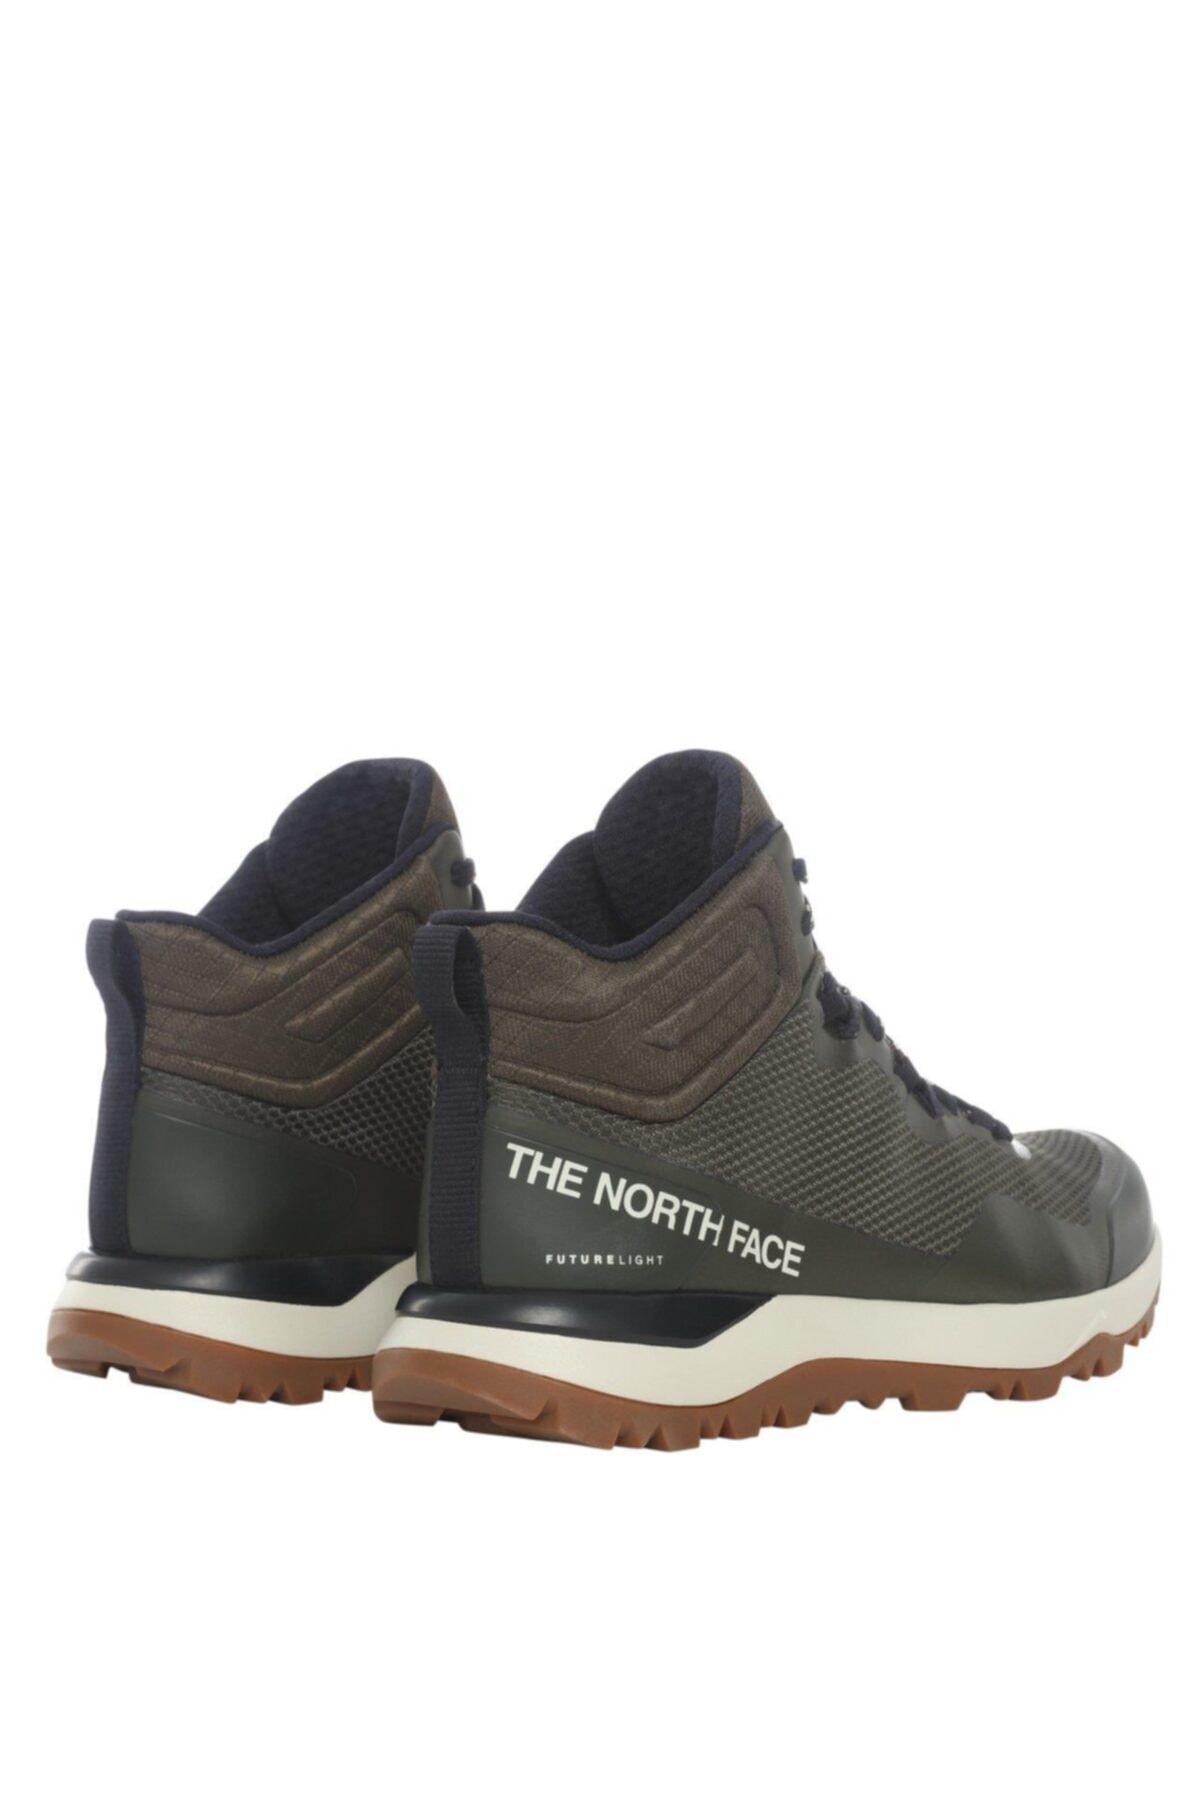 THE NORTH FACE Kadın Haki Bot ve Ayakkabısı W Activist Mid Ftrlt Nf0a47azv981 2